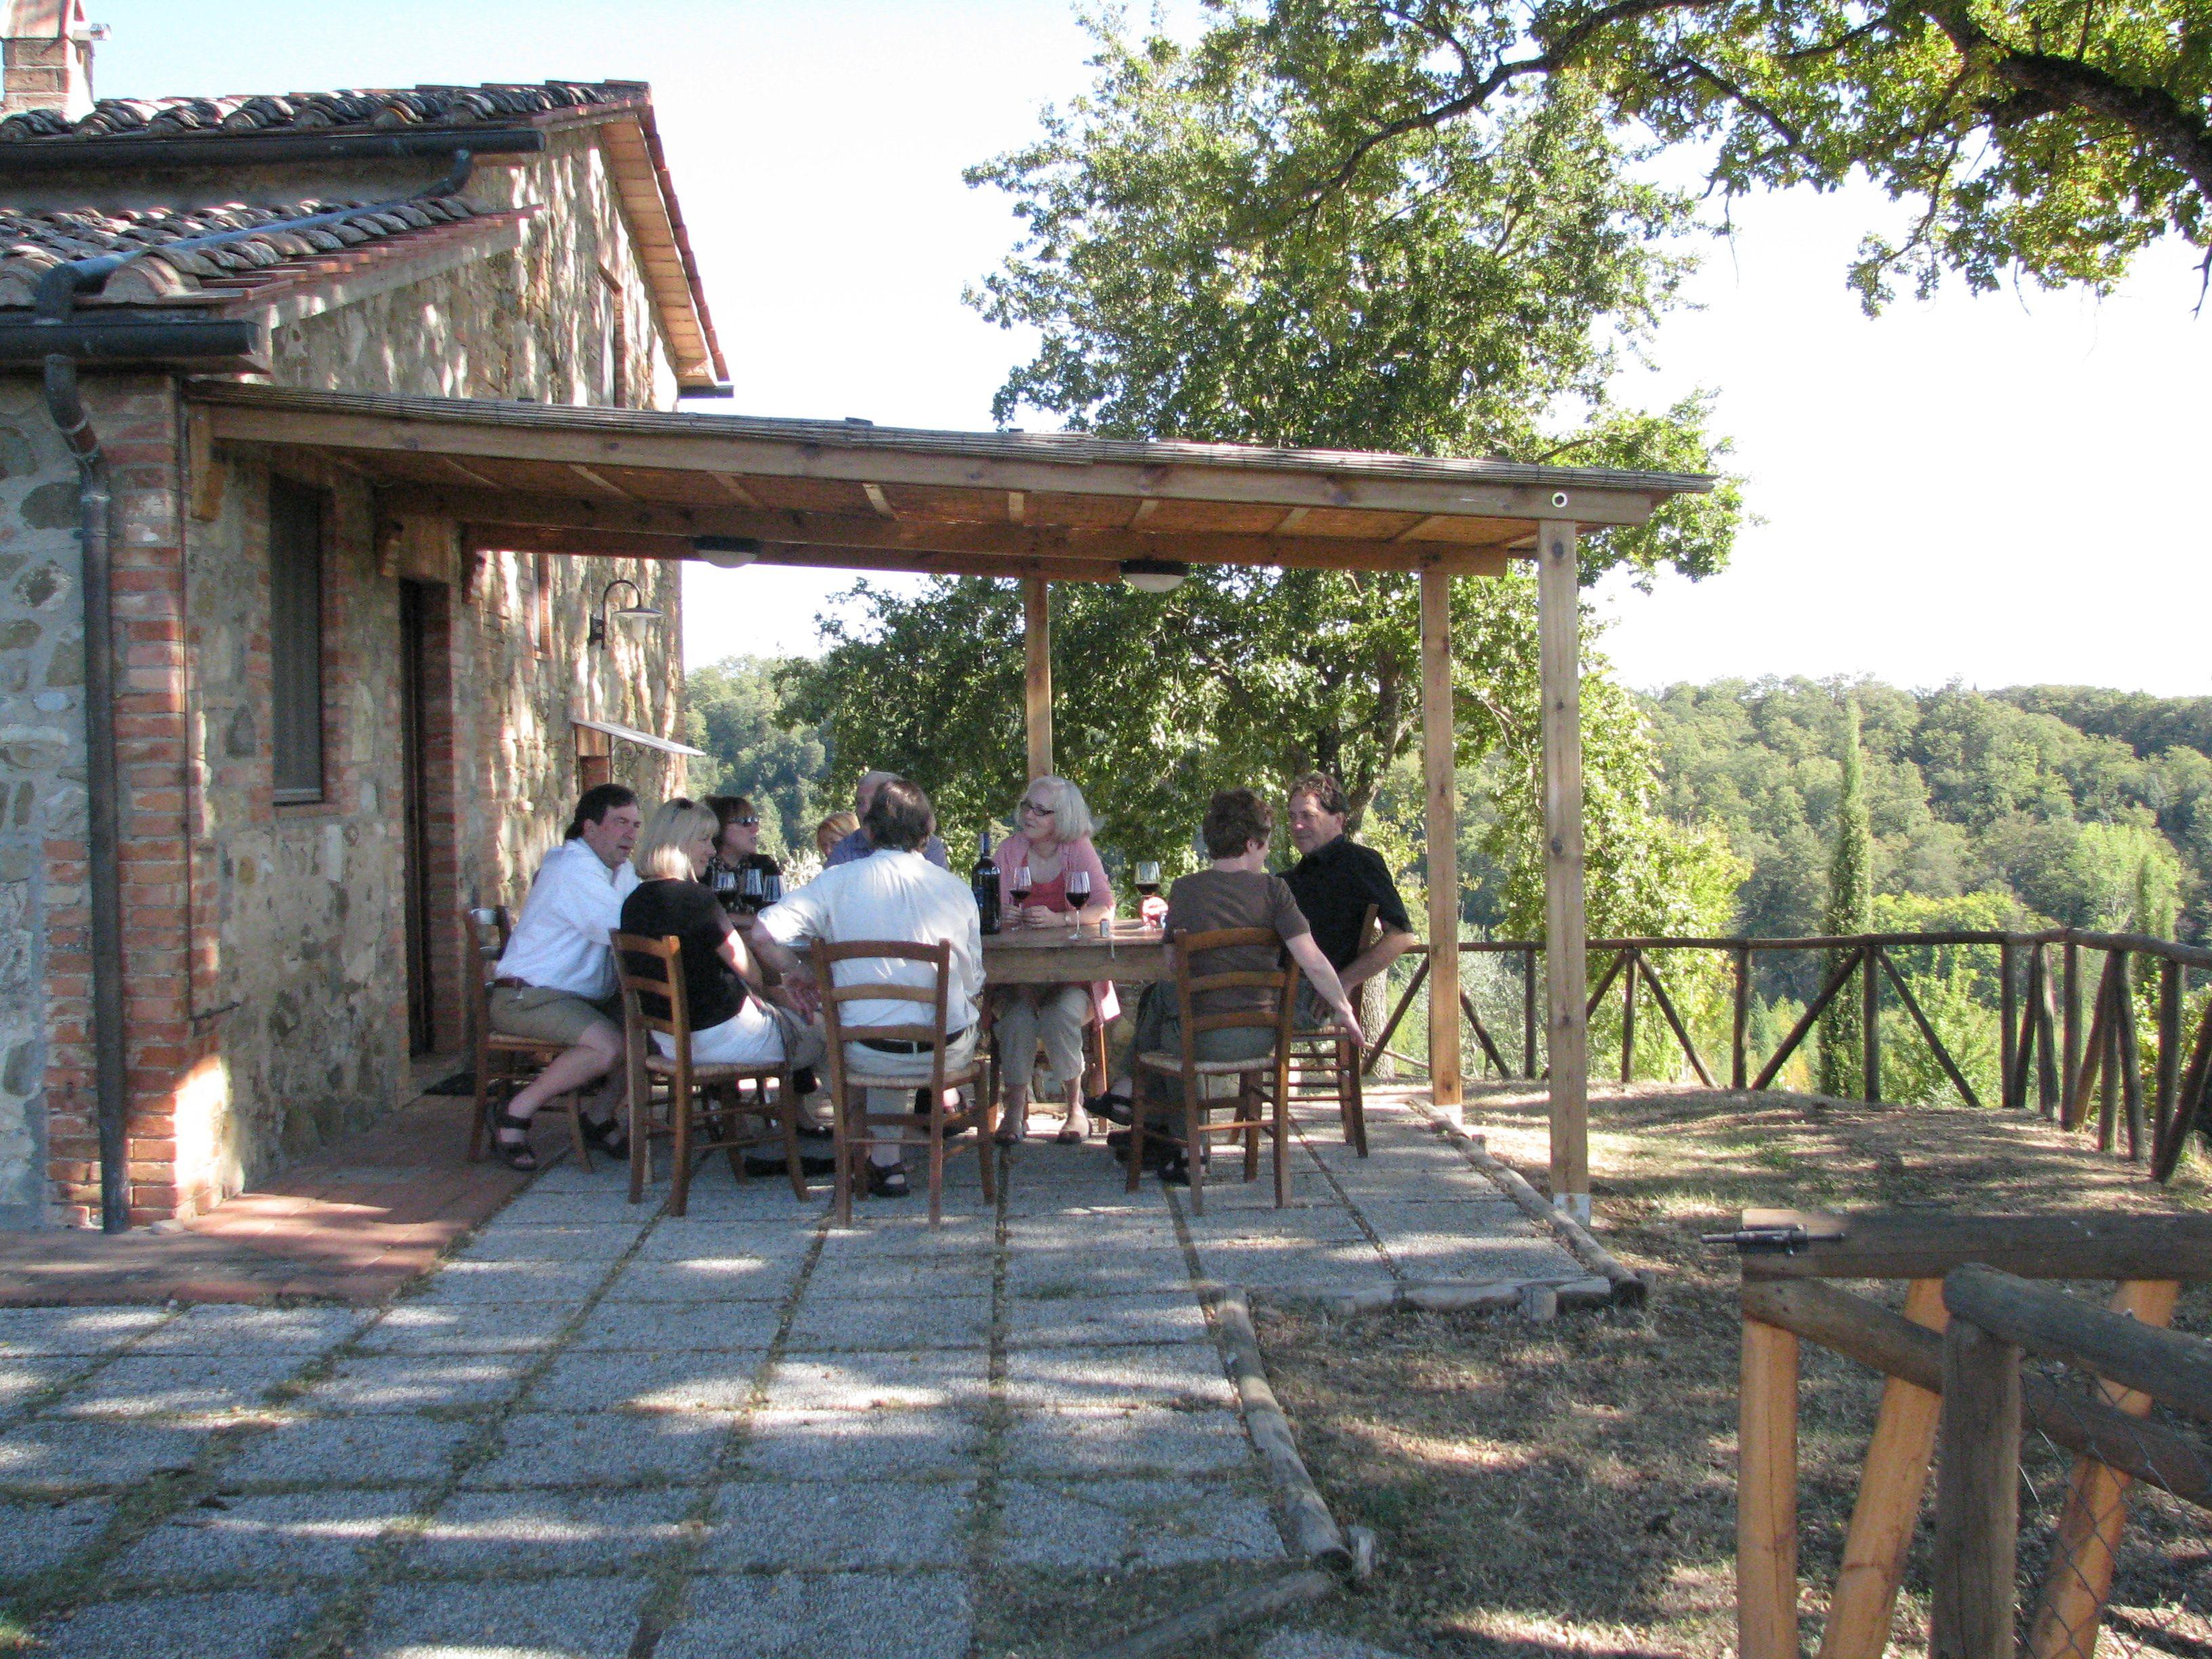 First afternoon at the villa, drinking Poggio Bonelli